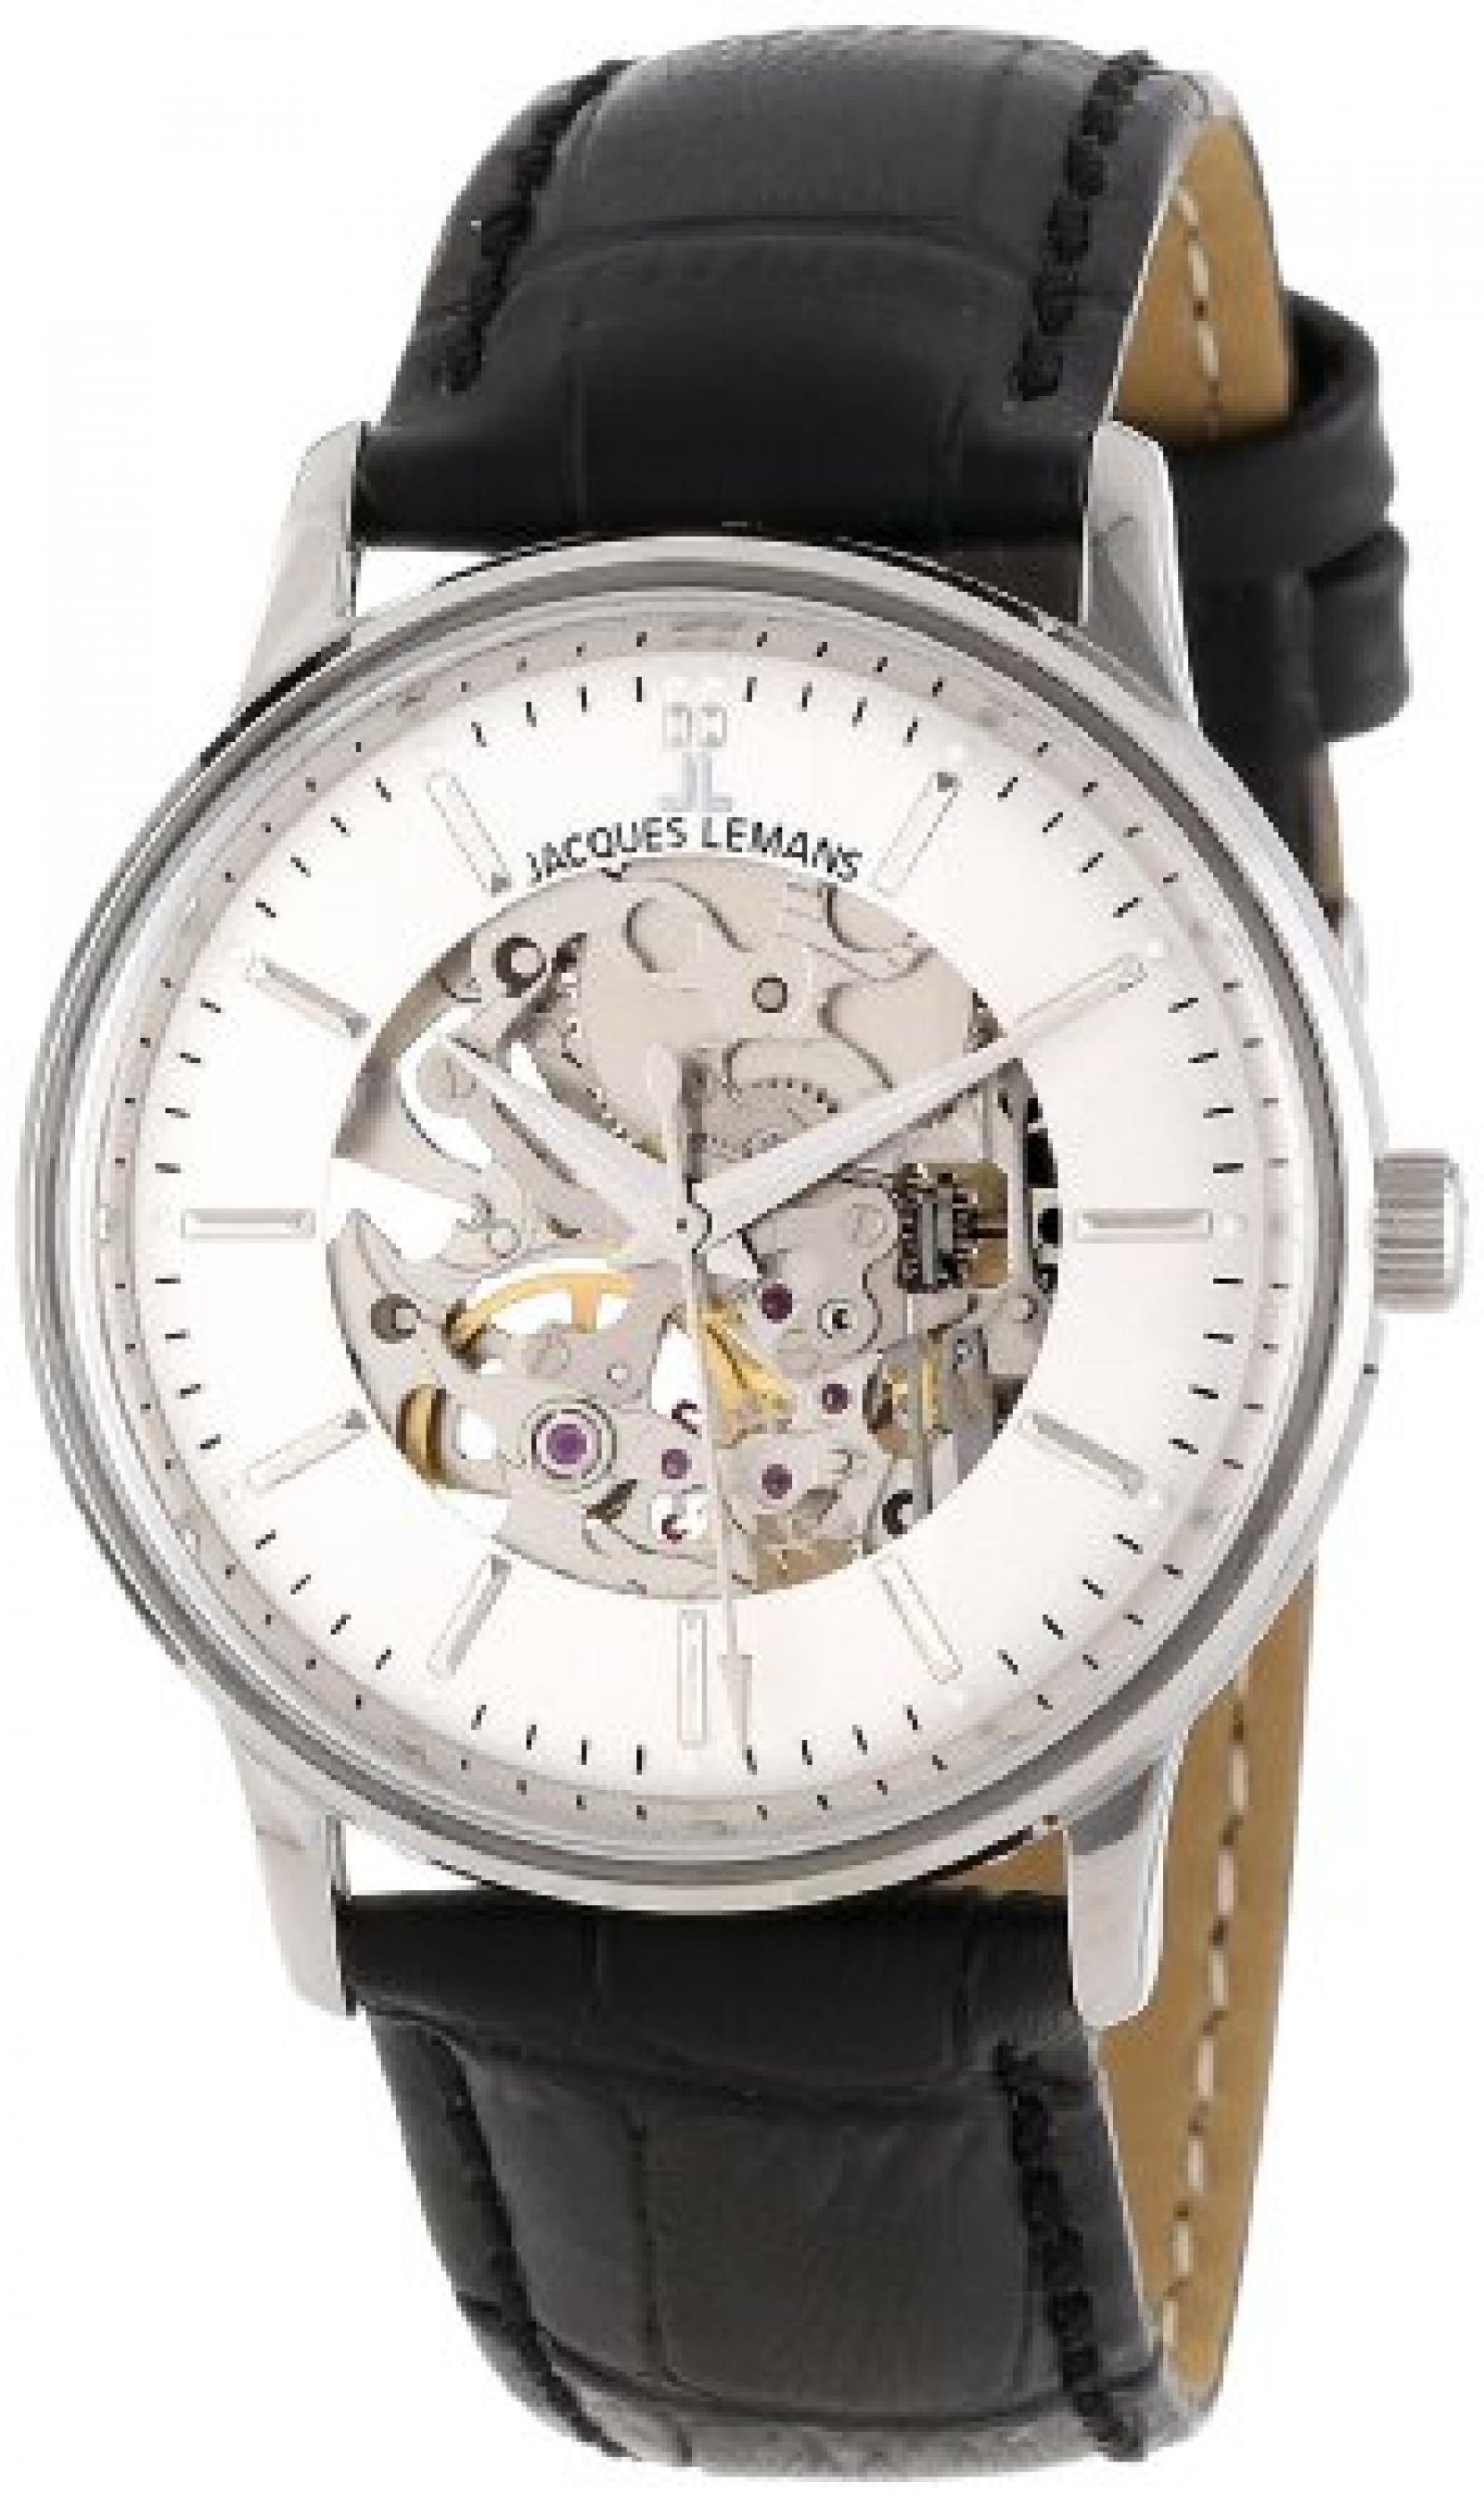 Jacques Lemans N-207A NOSTALGIE Mechanisch Damen Uhr Damenuhr Lederarmband Edelstahl 50m Analog schwarz